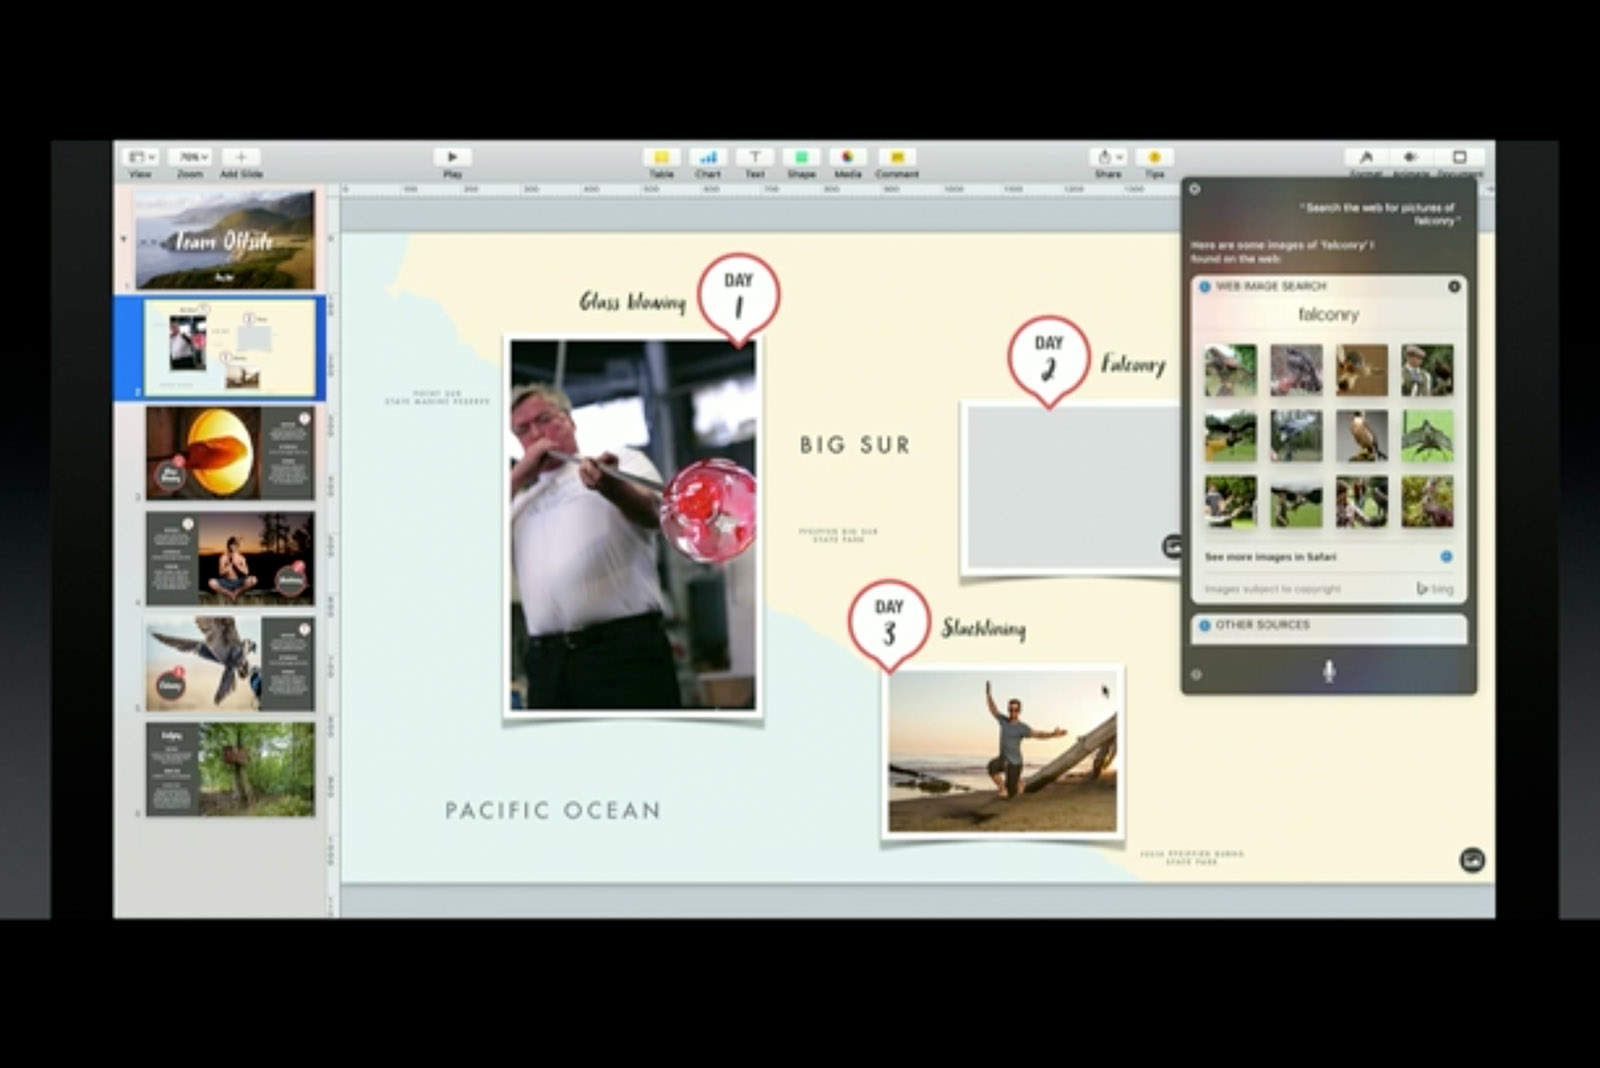 Siri on Mac is good for productivity tasks like creating documents.